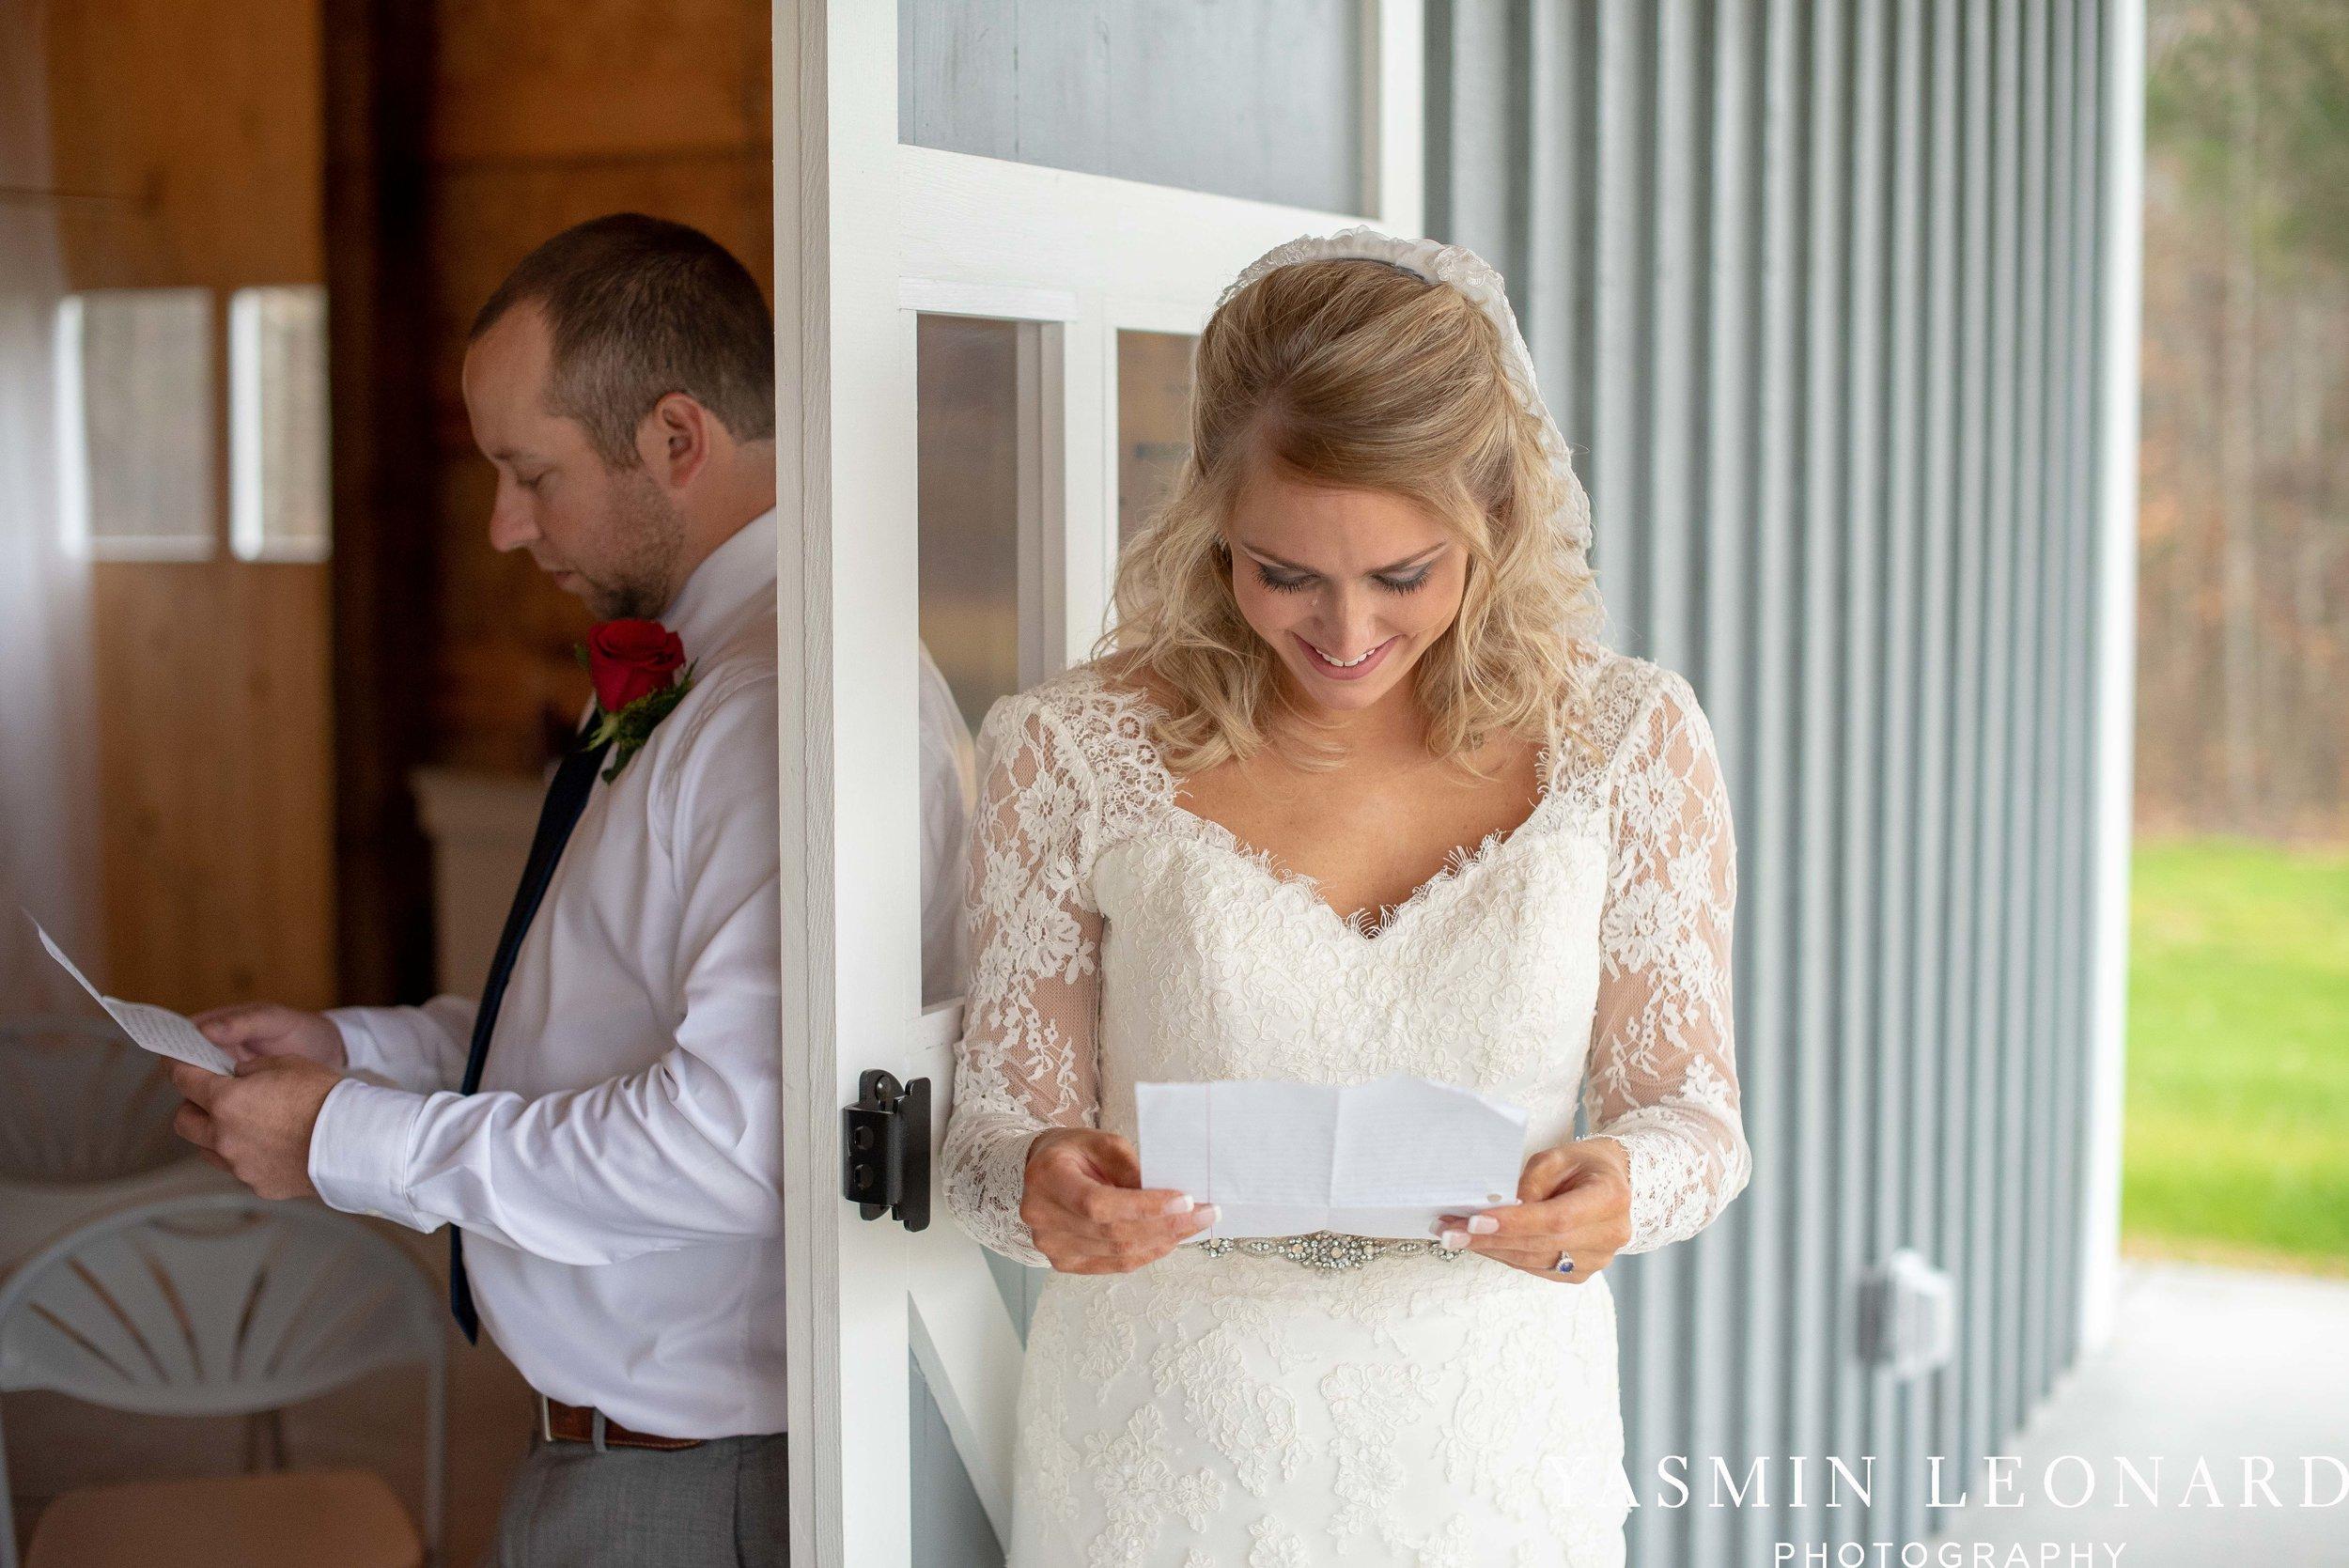 Secret Meadows at Green Dell Farm, NC Barns, NC Wedding Venues, Triad, NC, NC Wedding Photography, Triad Wedding Venues, Affordable Wedding Venues, NEW Wedding Venues, Christmas Weddings-17.jpg